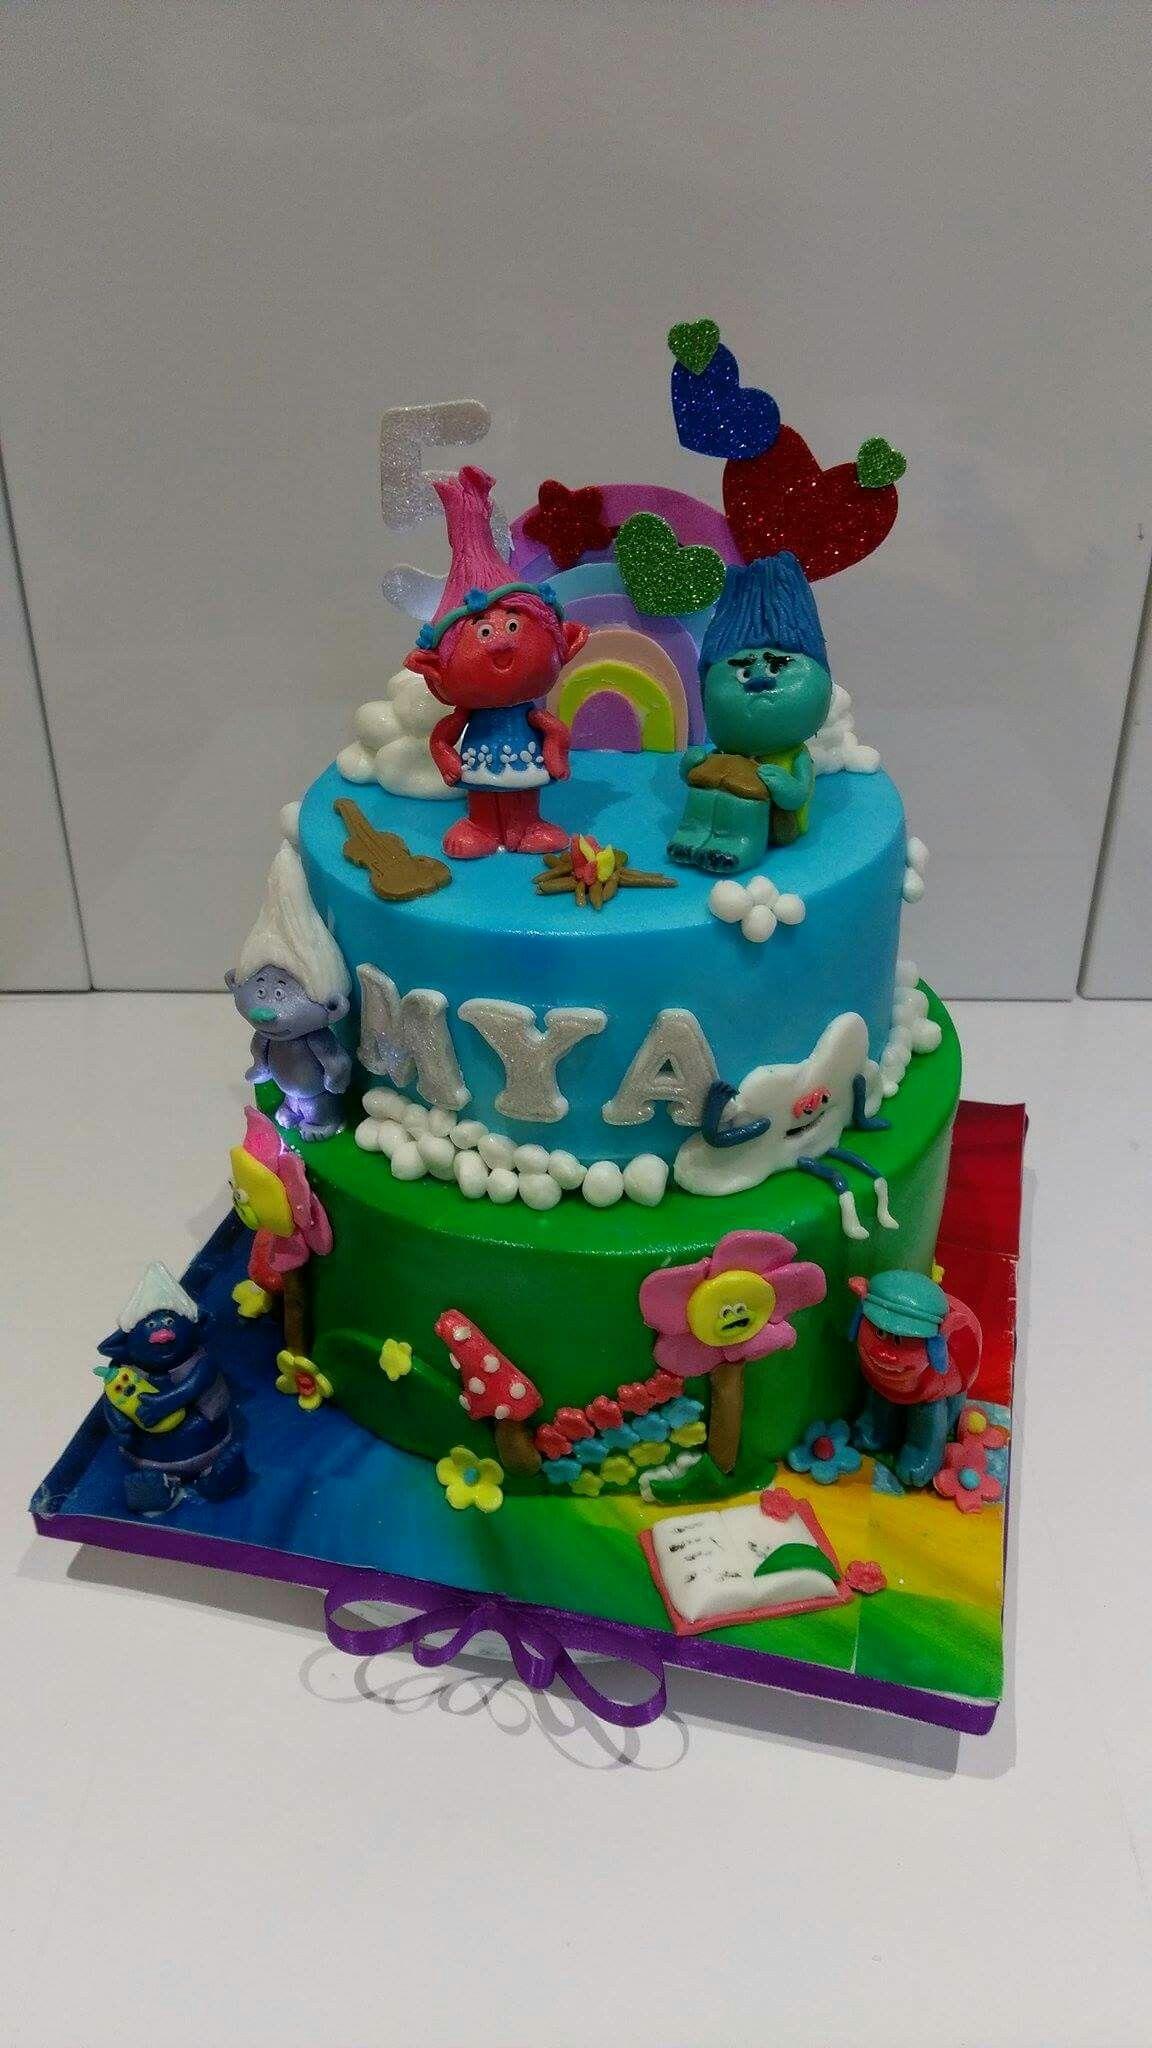 Cake Design Trolls : Trolls cake hailey 6th birthday Pinterest